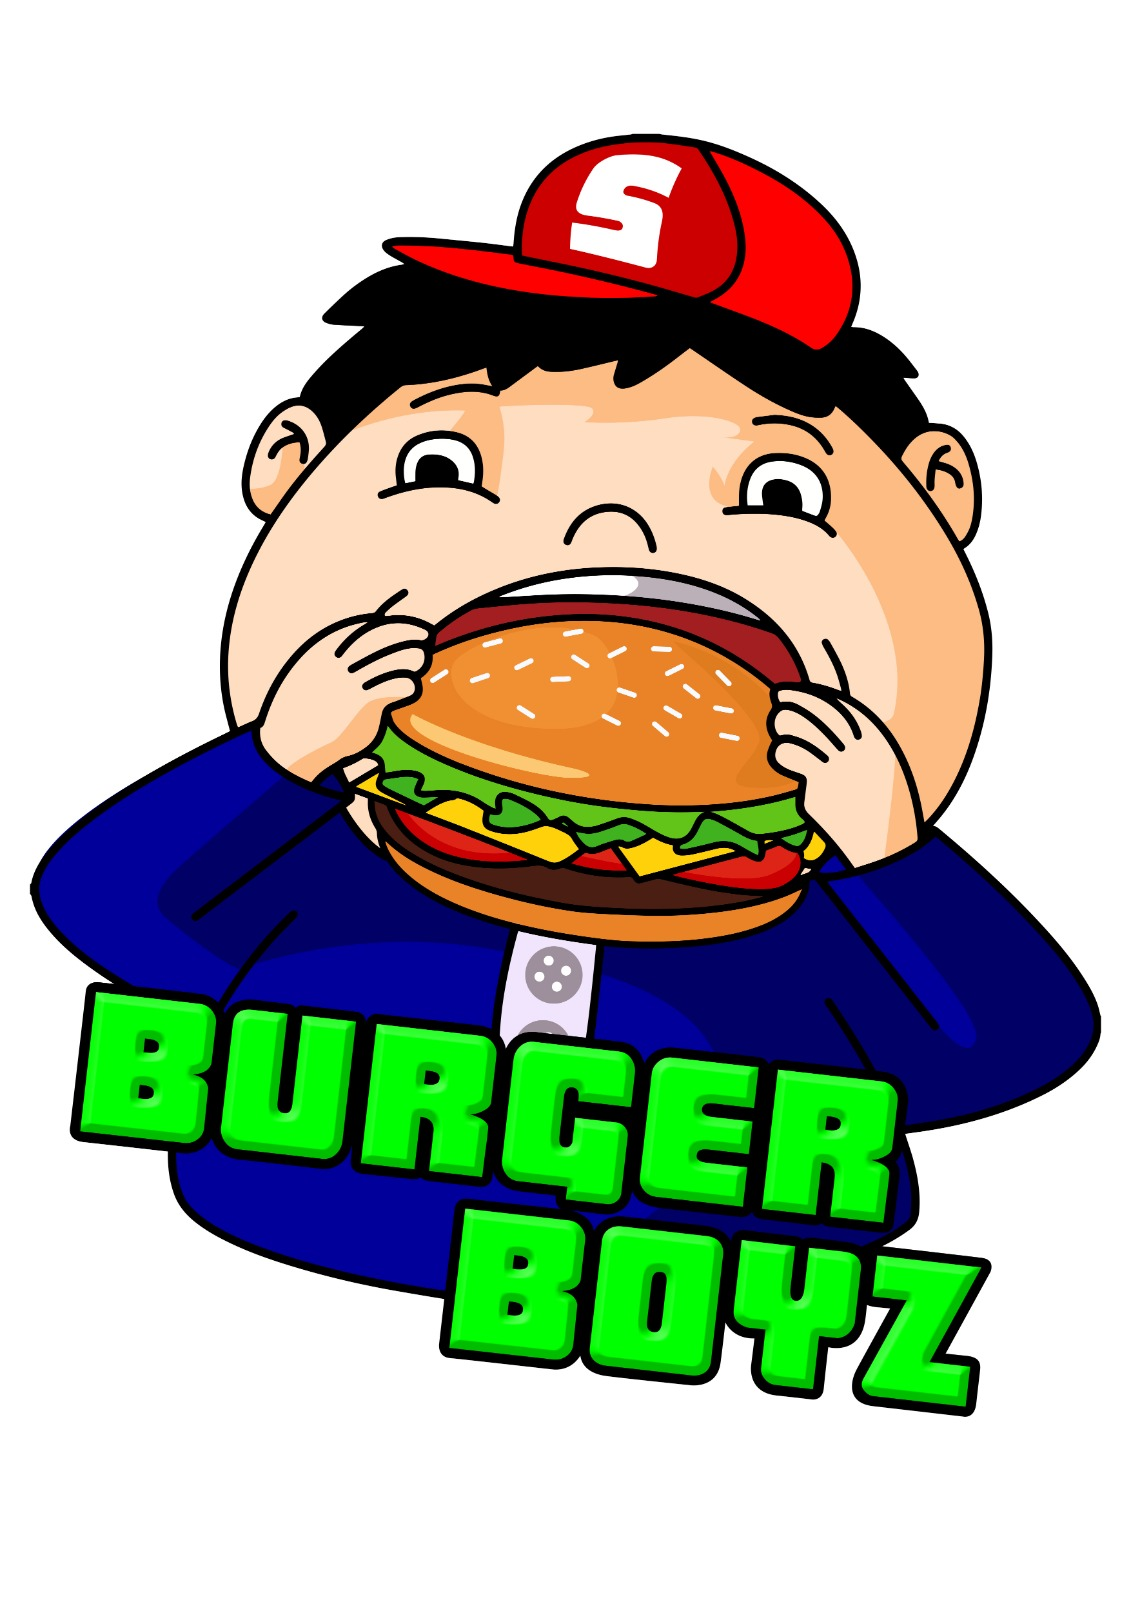 Burgerboyz